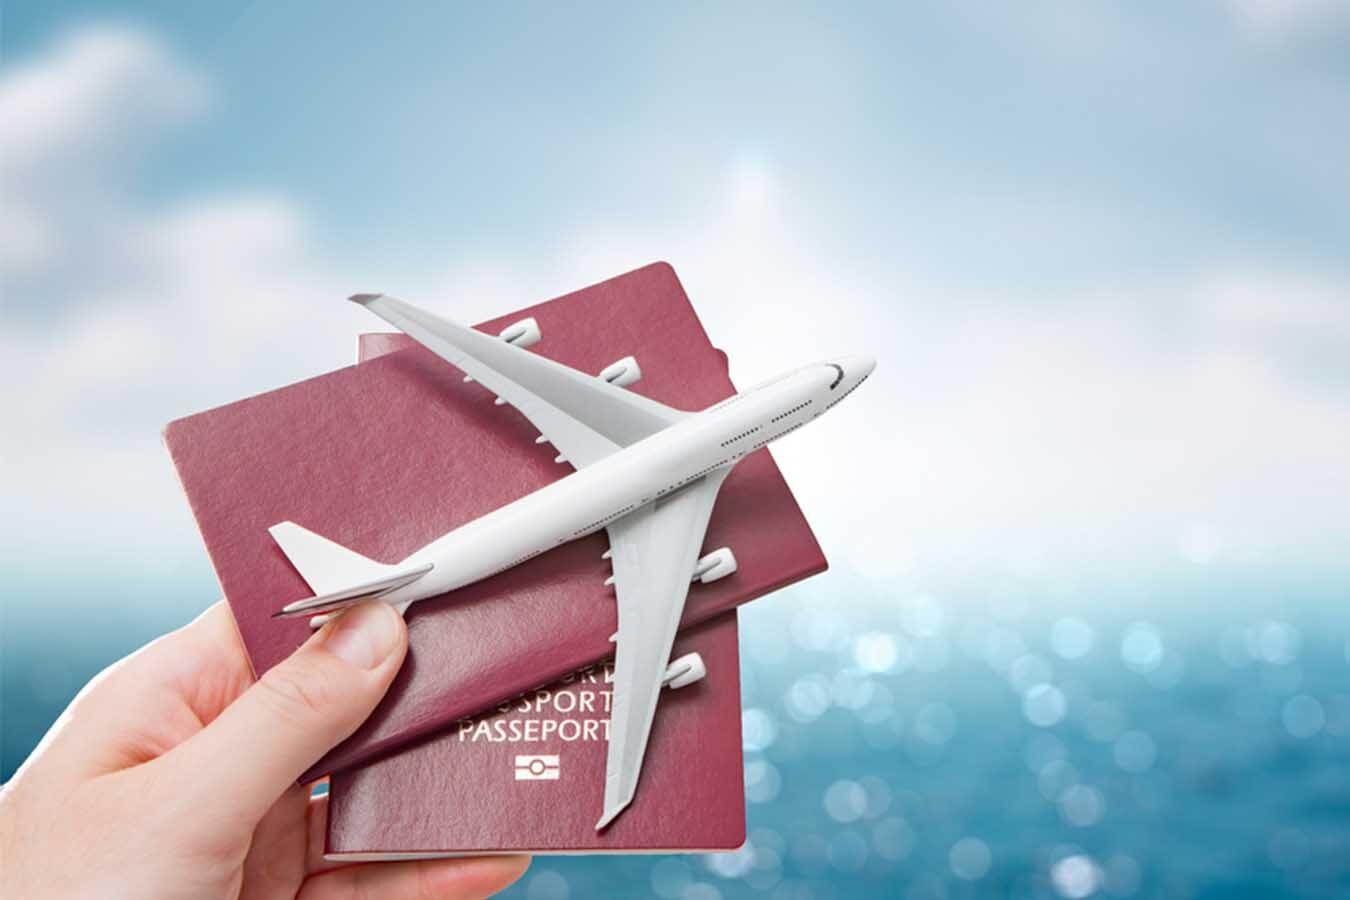 pasaport gecis sistemi - Elektronik Pasaport (E-Pasaport) Nedir?